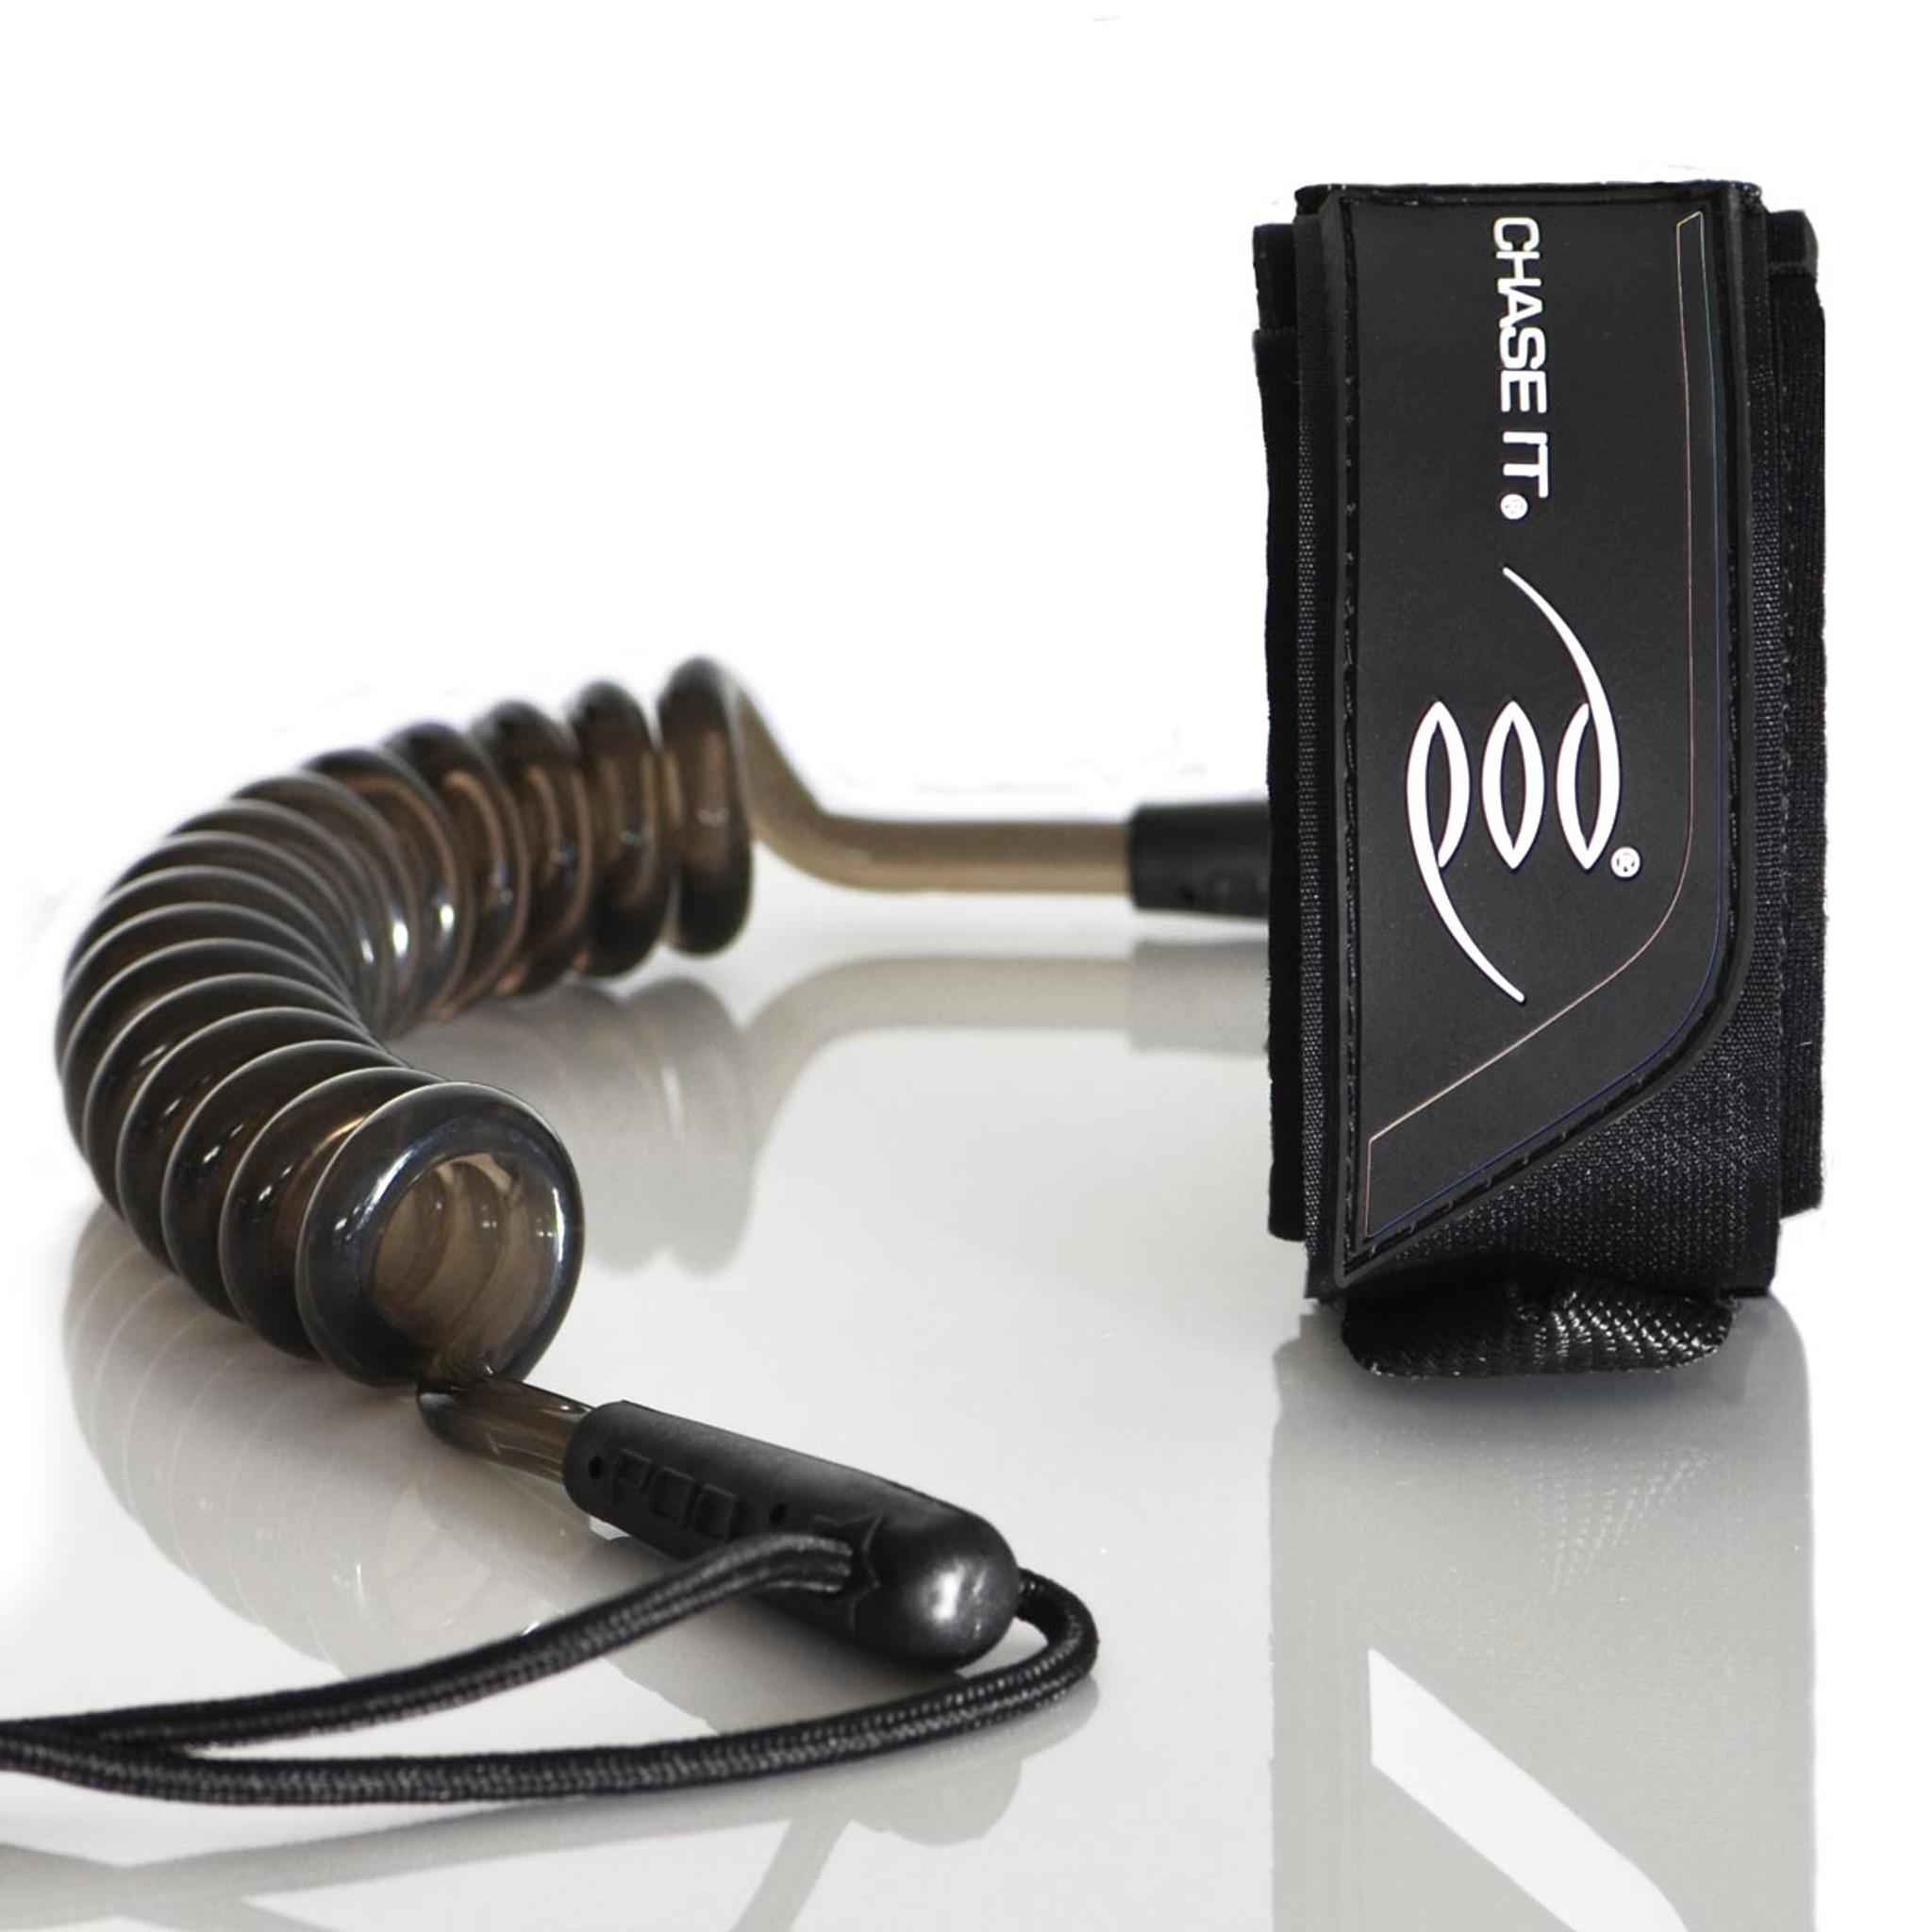 Wrist Leash - Black Tint Cord